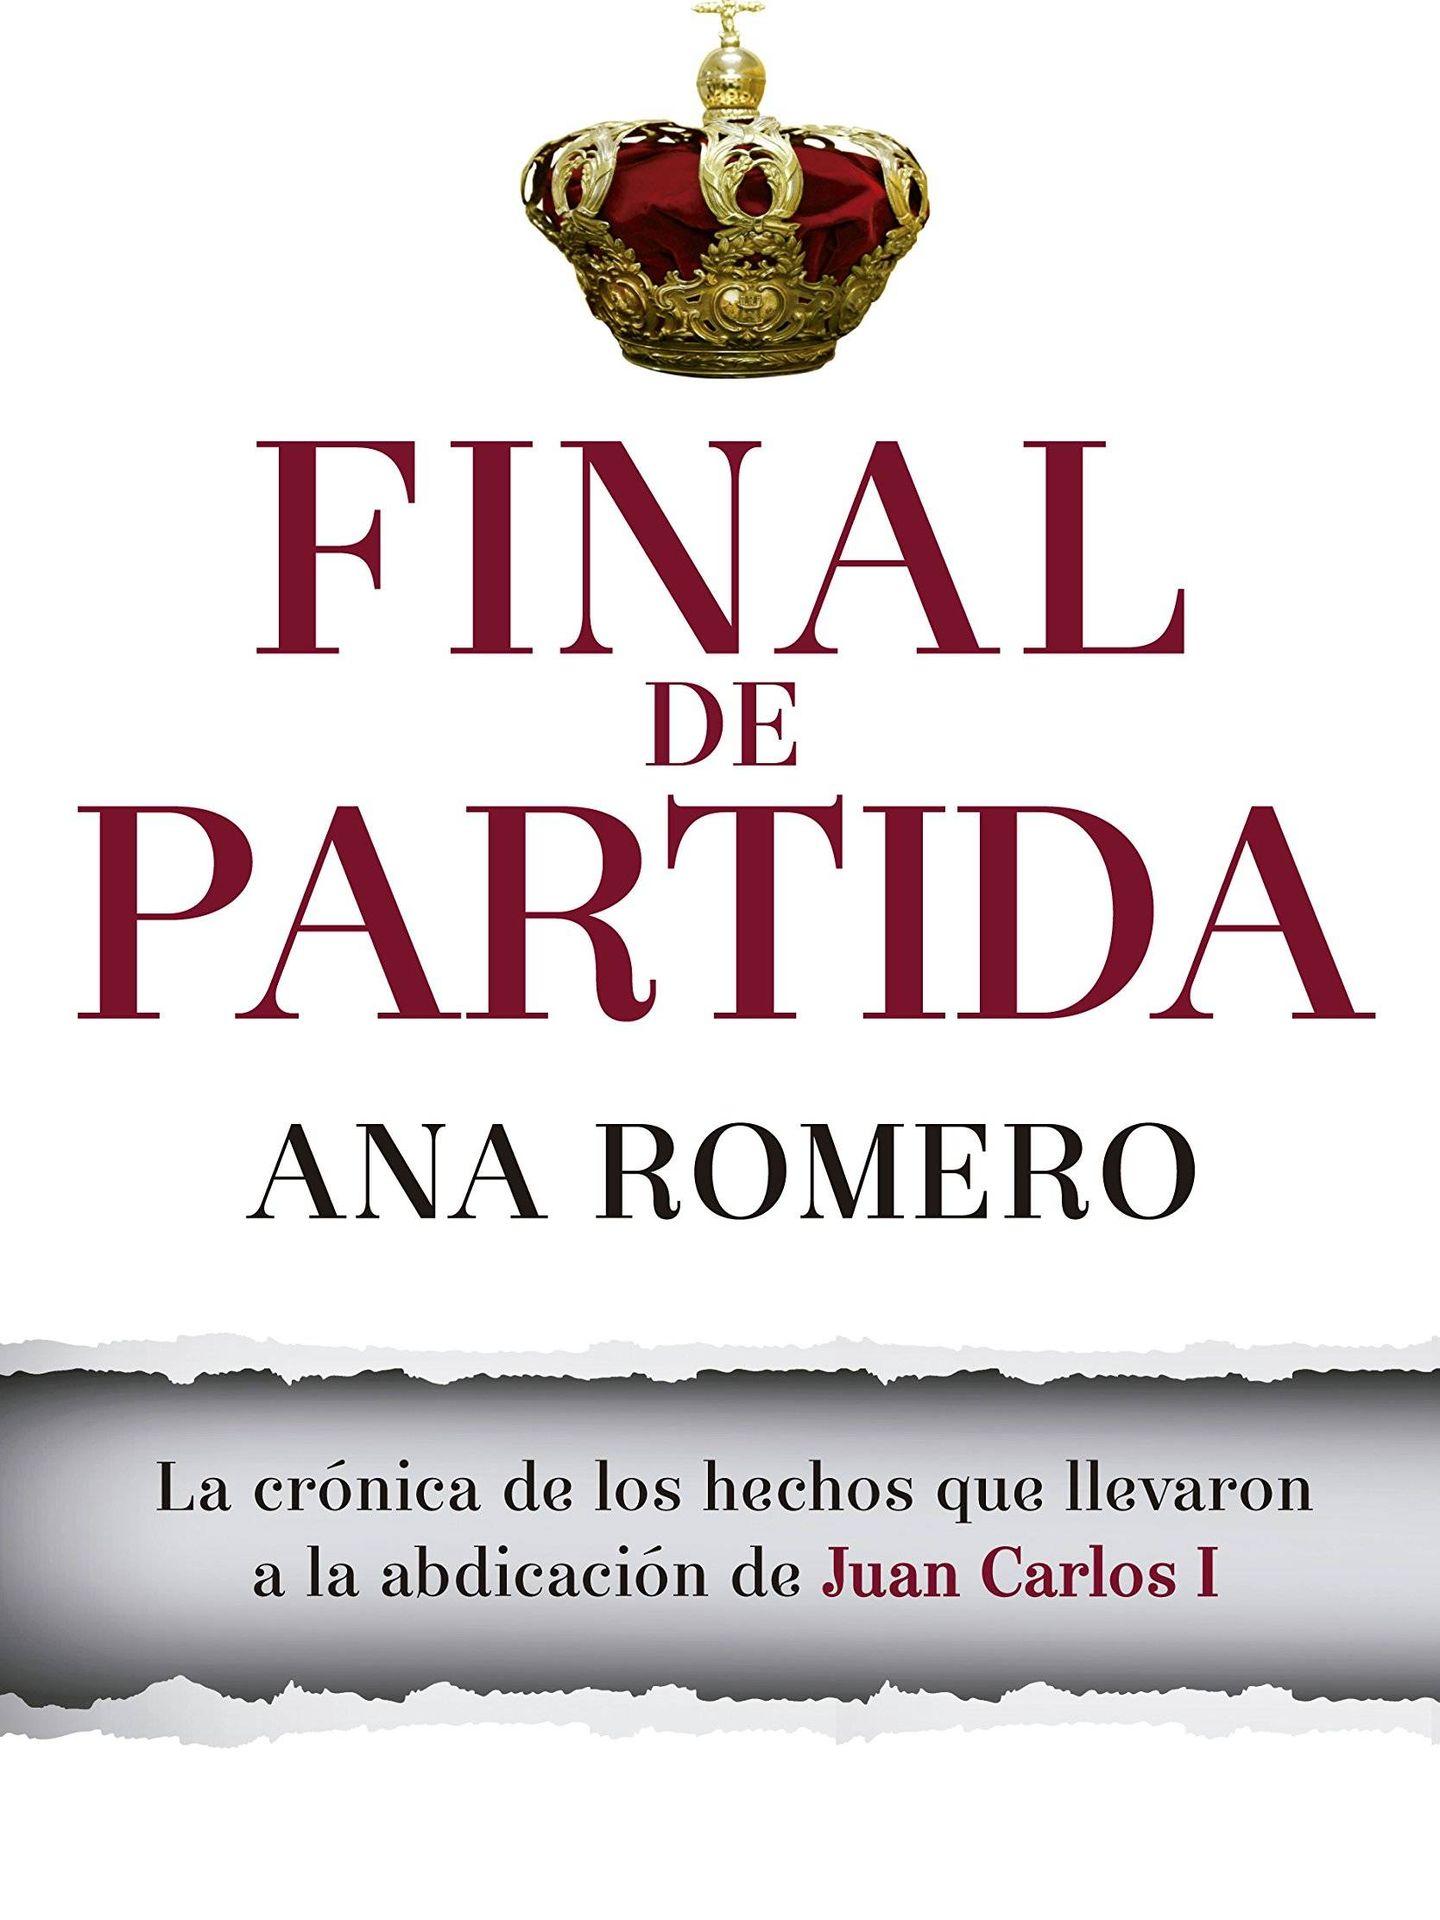 Portada del libro de Ana Romero. (La Esfera)